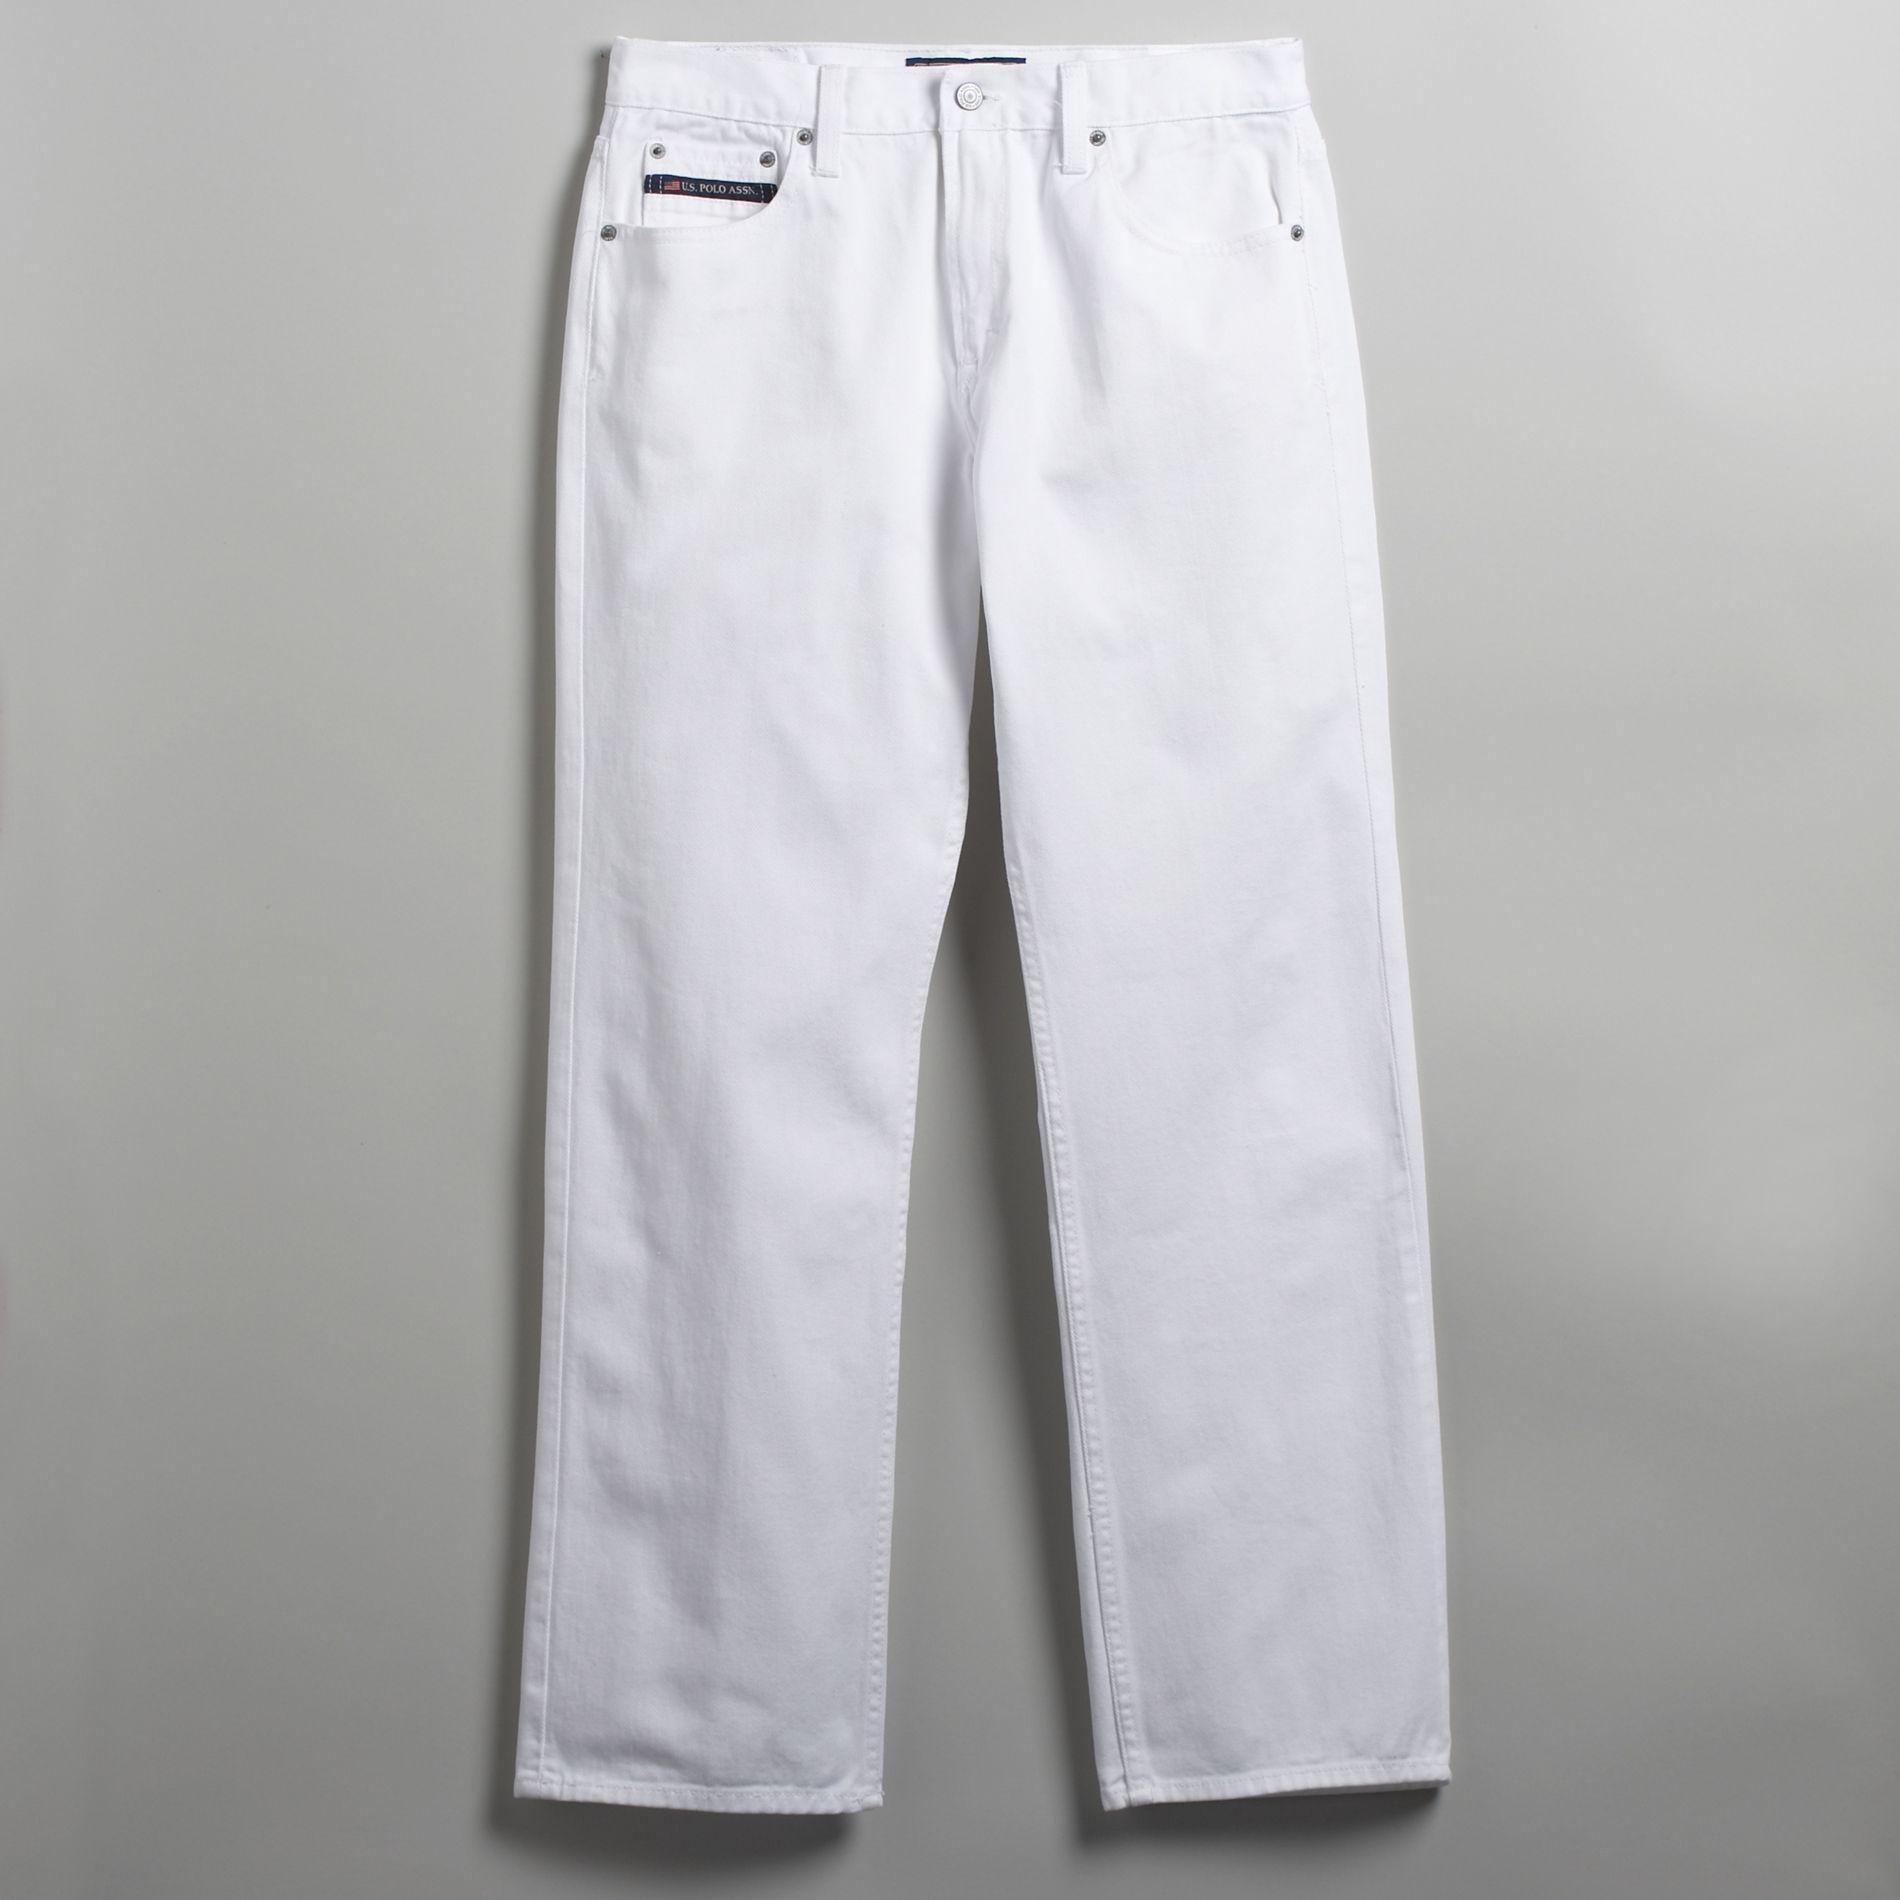 U.S. Polo Assn Carpenter Jeans